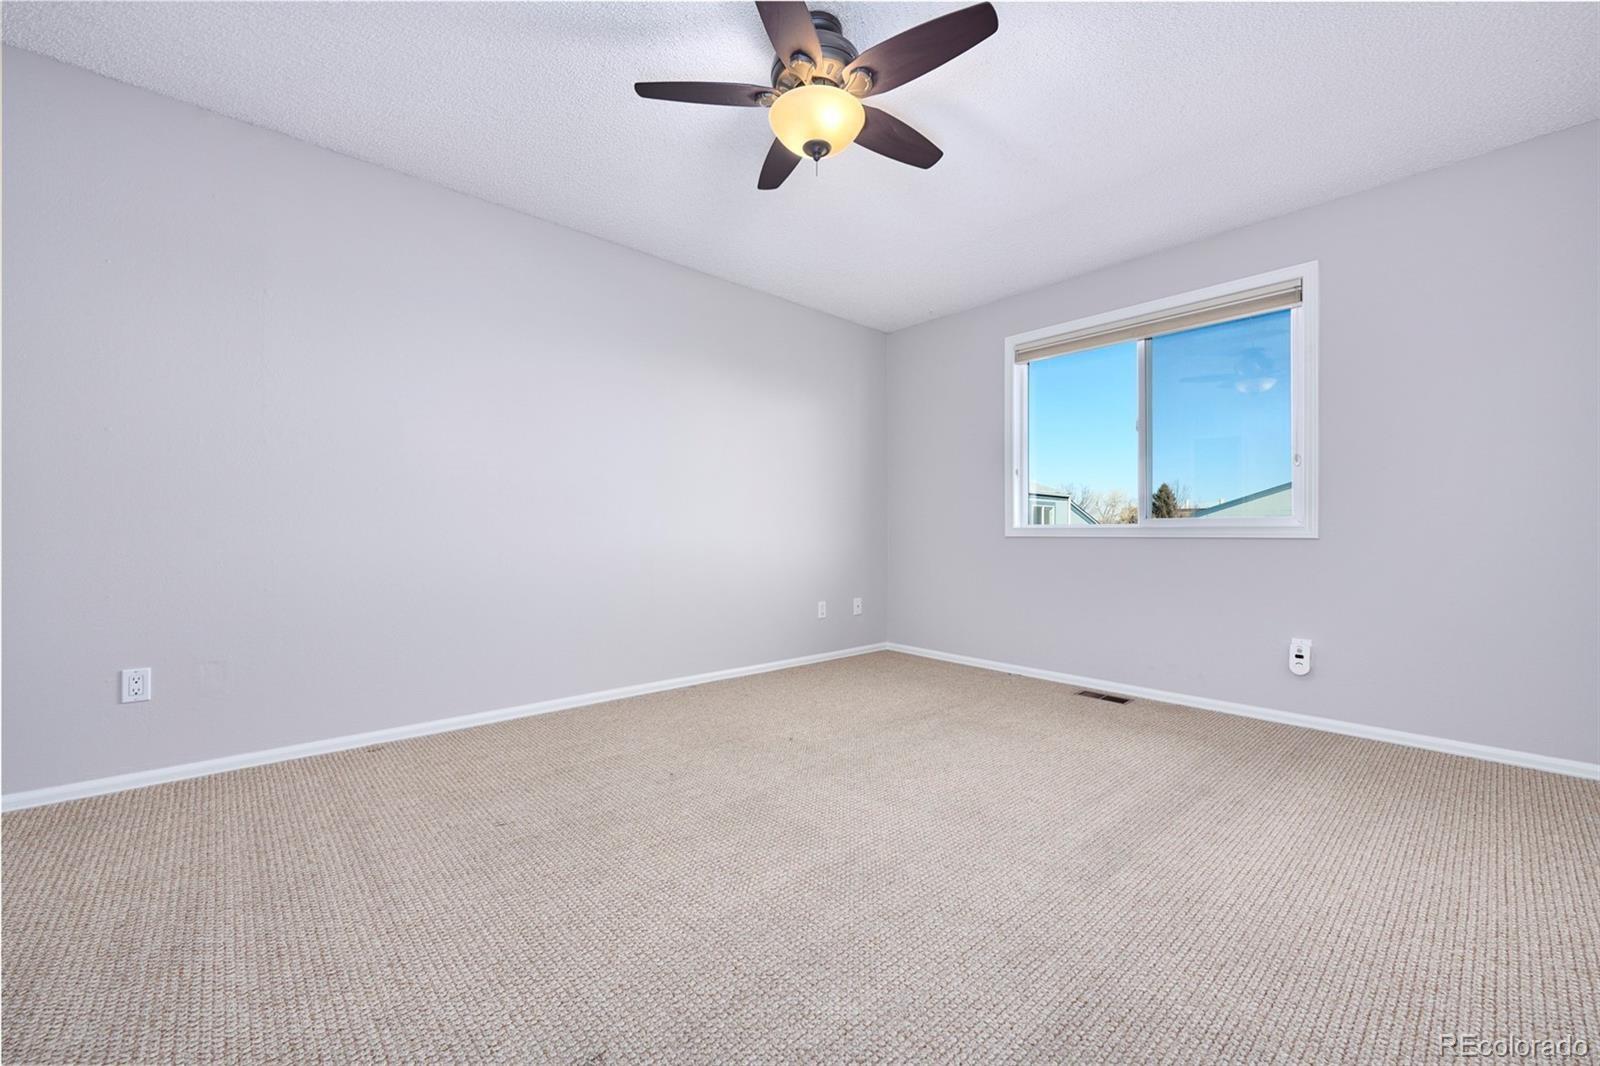 MLS# 4164486 - 15 - 4207 Monroe Drive #D, Boulder, CO 80303